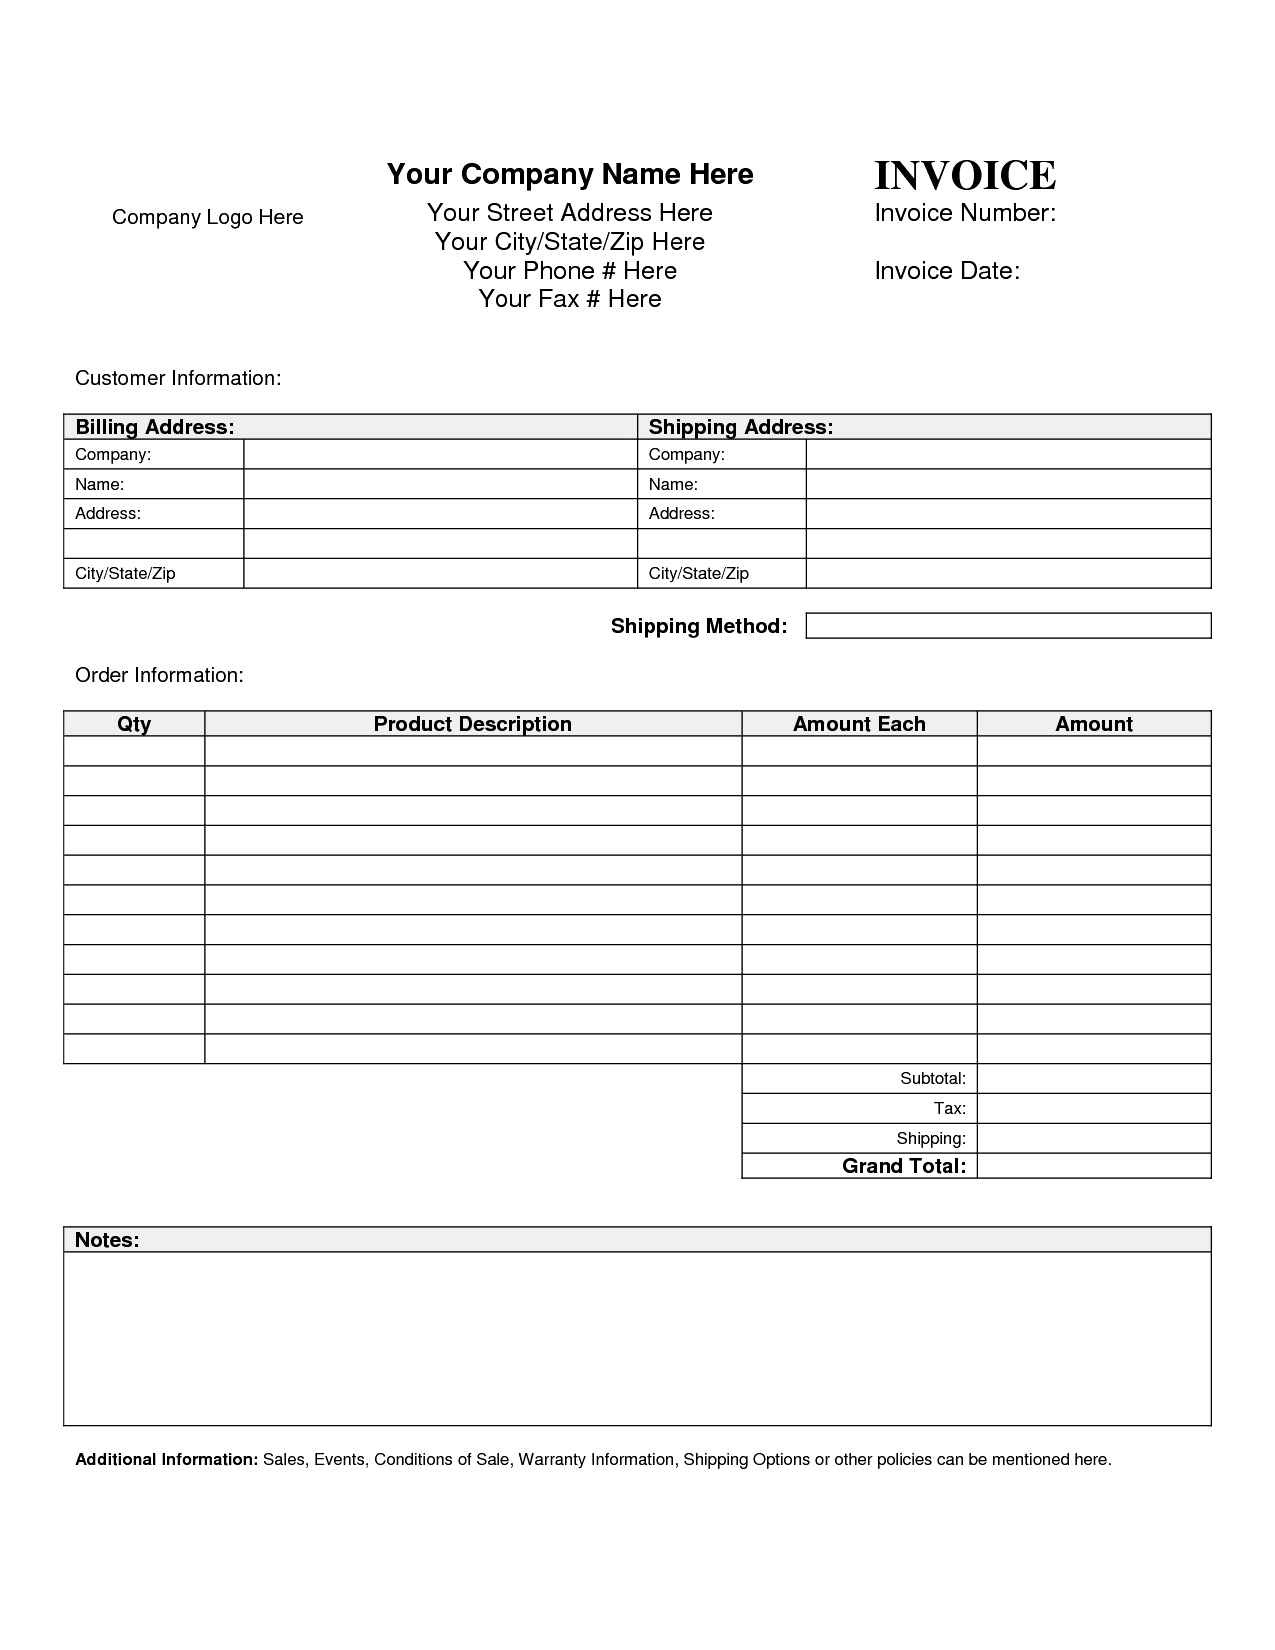 Free Printable Blank Invoice Sheet Templates Word Template Sample - Free Printable Customer Information Sheets